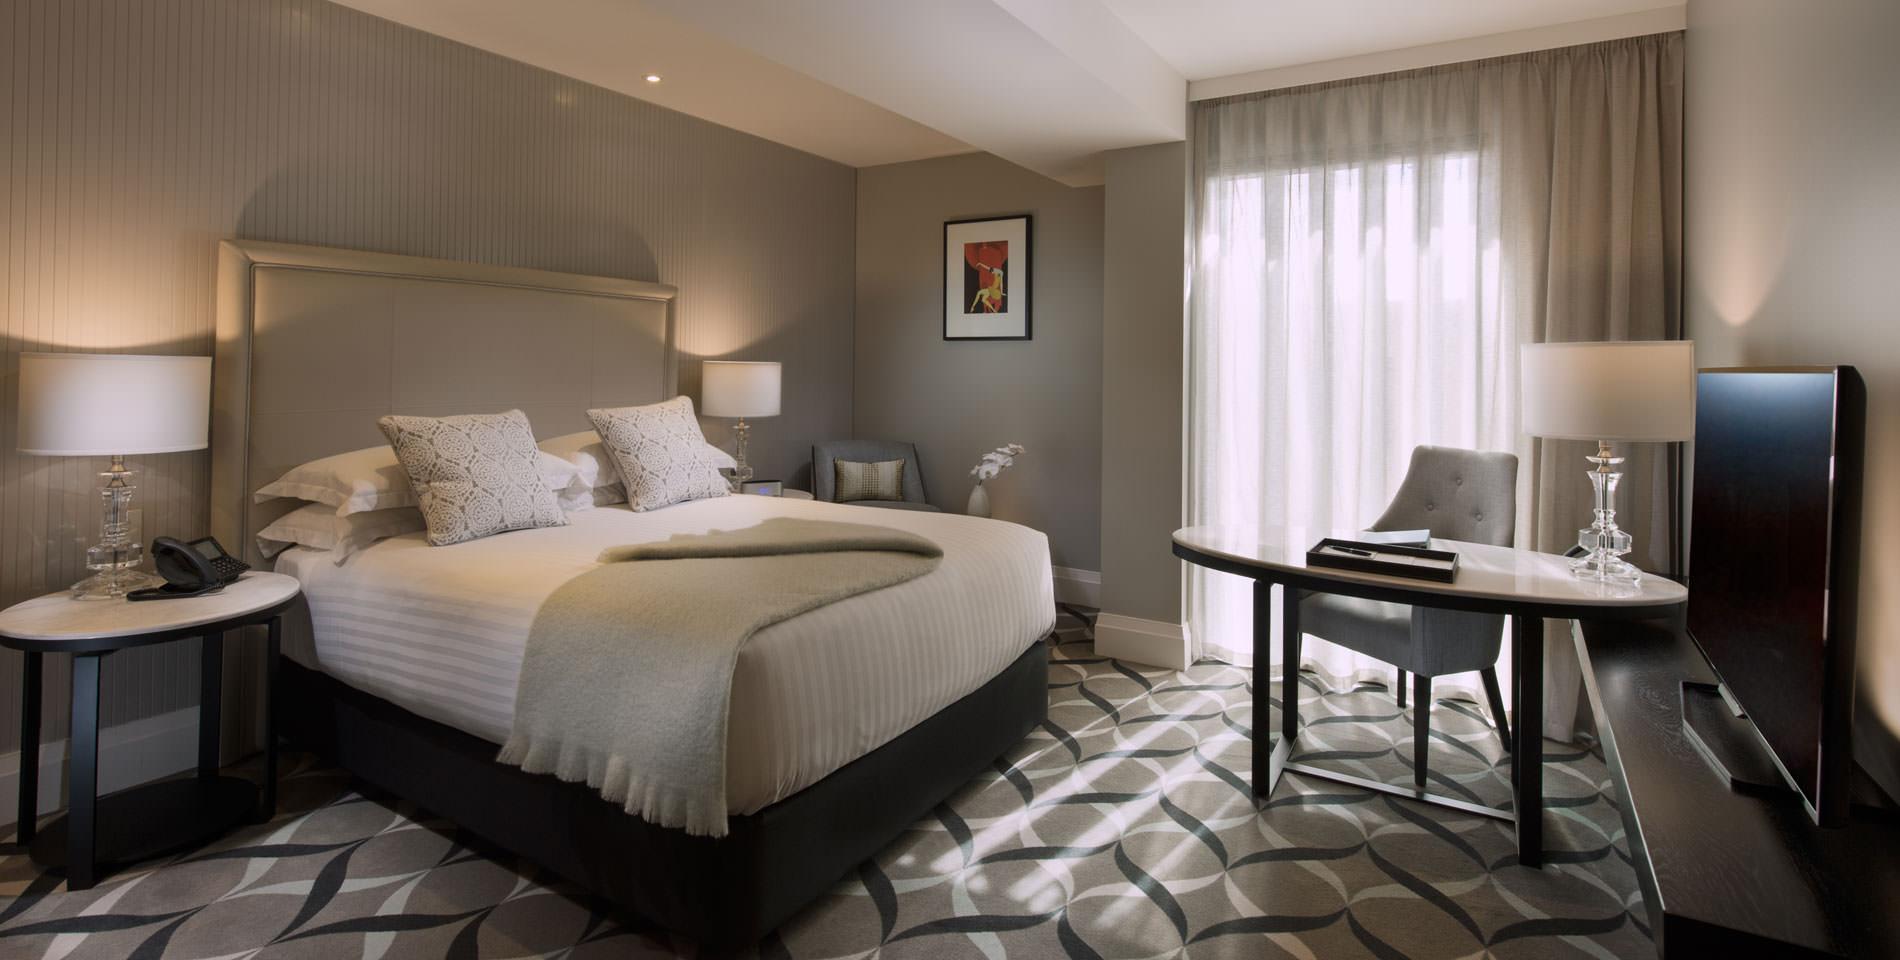 Bedroom's Look and Feel